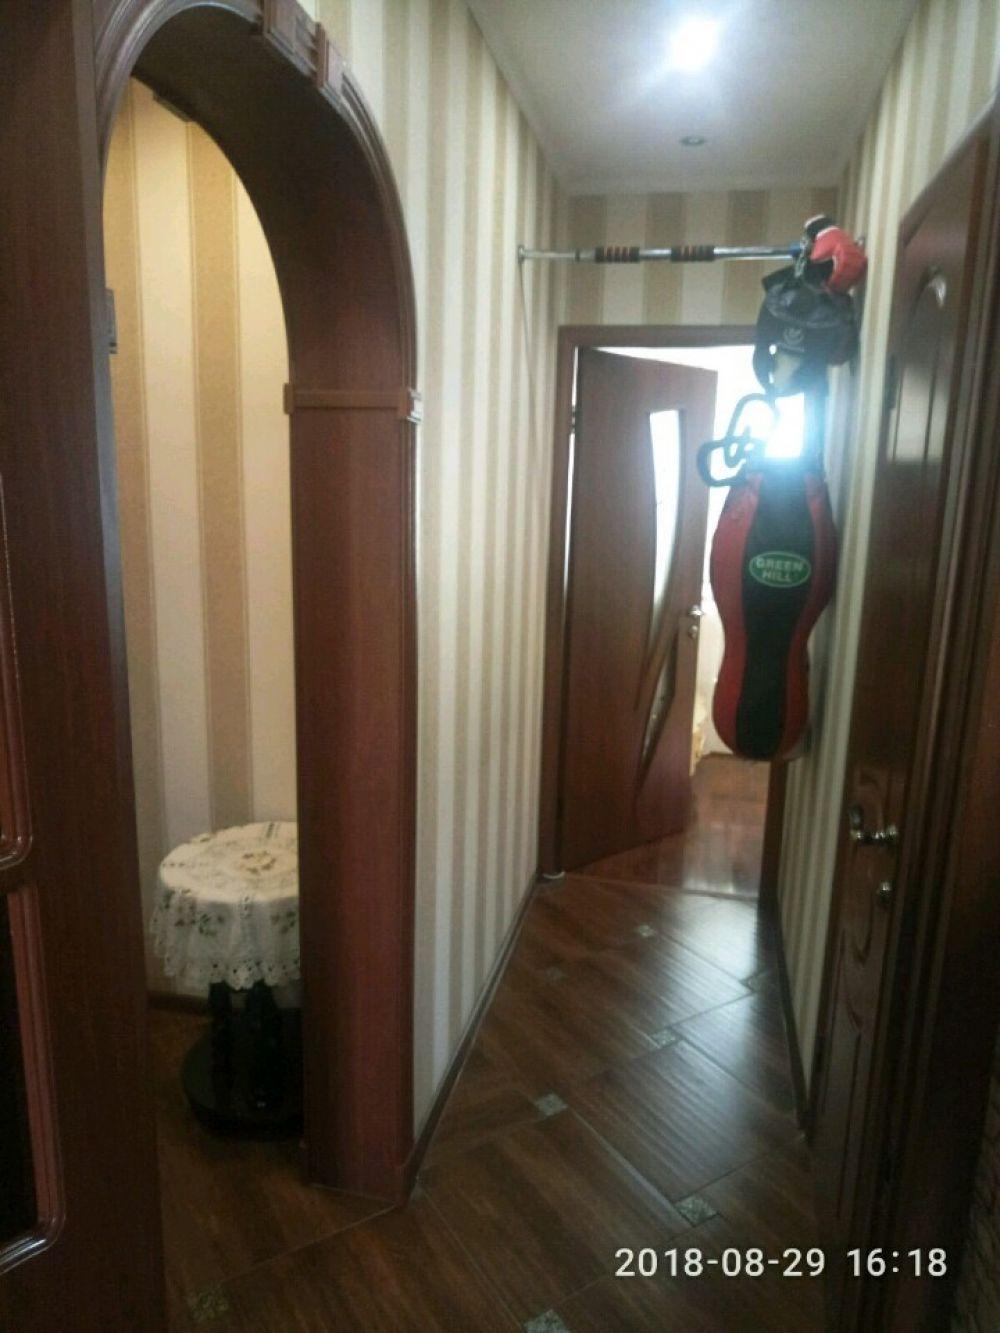 2-к квартира, 56 м2, 7/16 эт. Фрязино, ул горького д.  7, фото 8